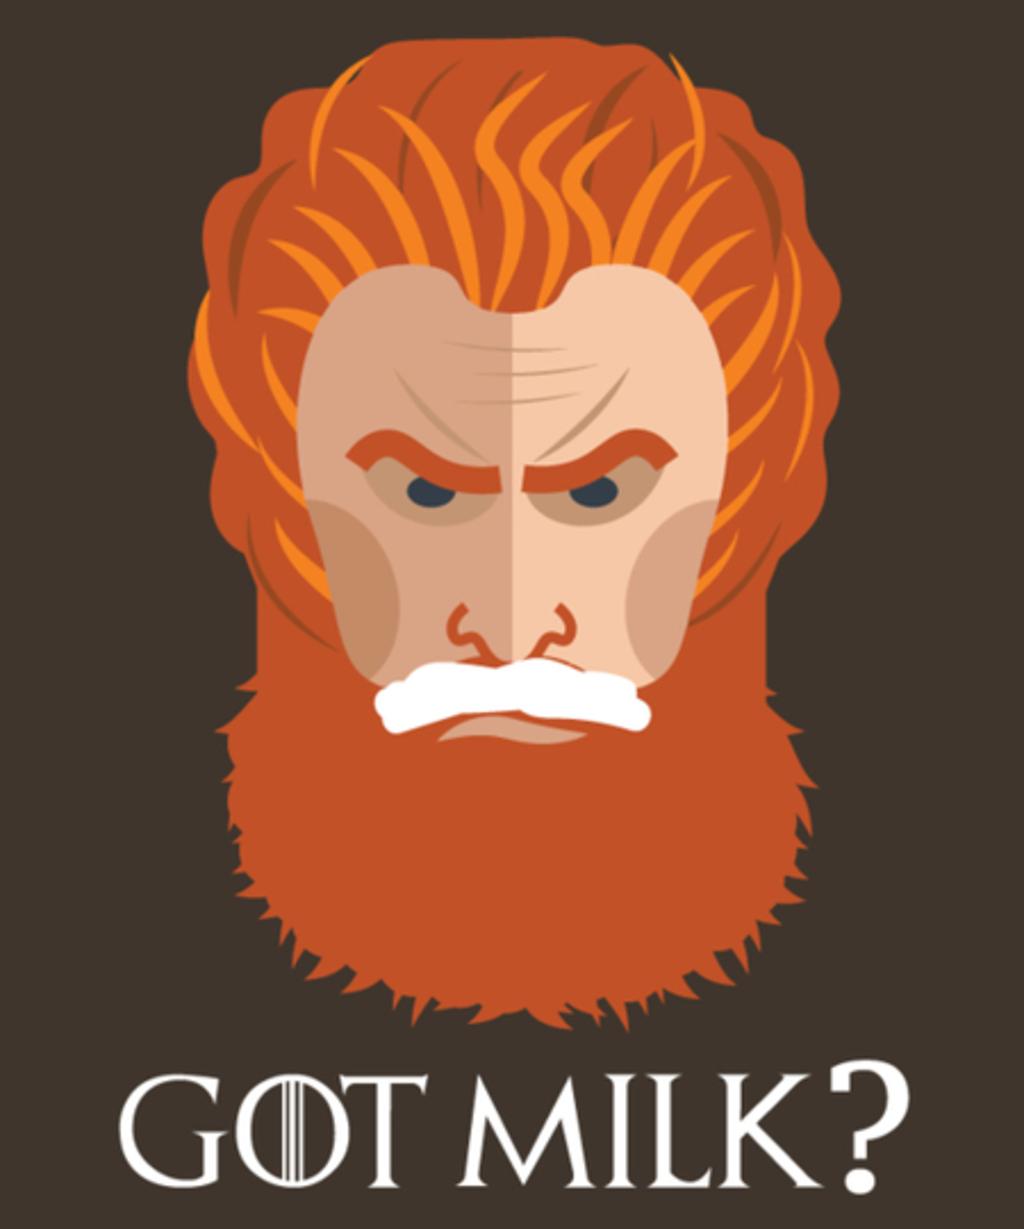 Qwertee: GOT MILK?